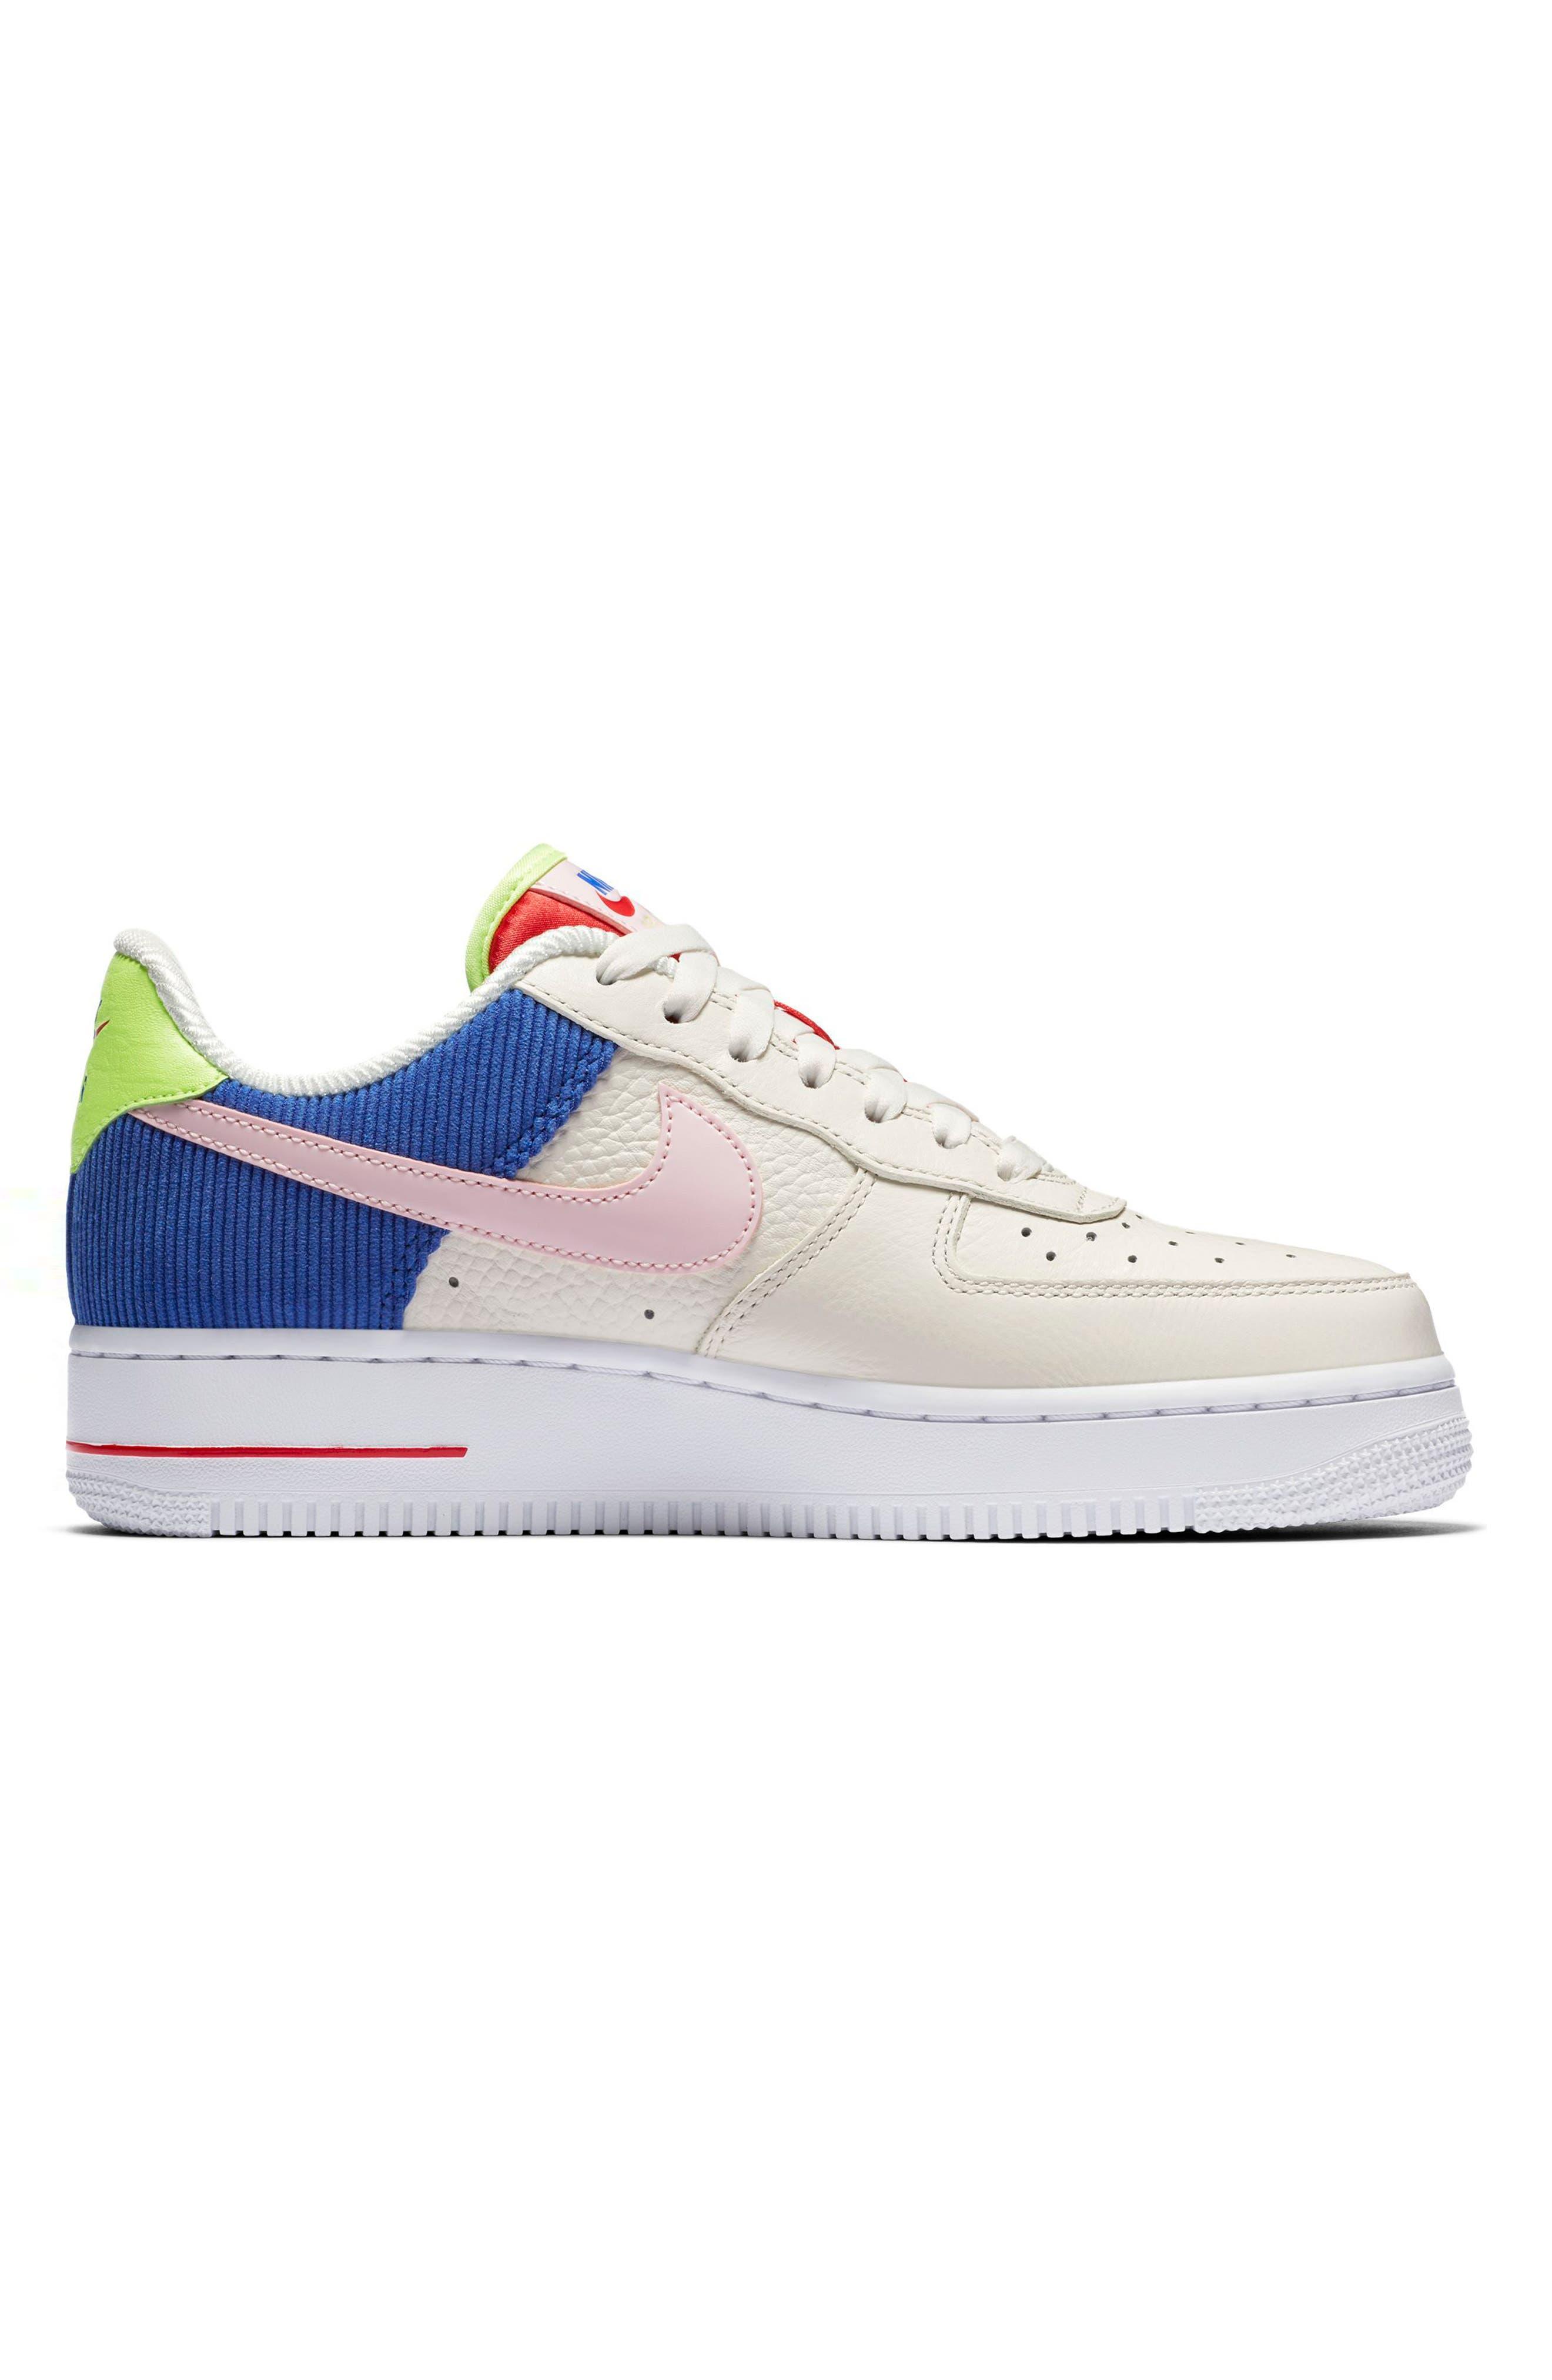 Air Force 1 Low Top Sneaker,                             Alternate thumbnail 3, color,                             Sail/ Arctic Pink-Racer Blue